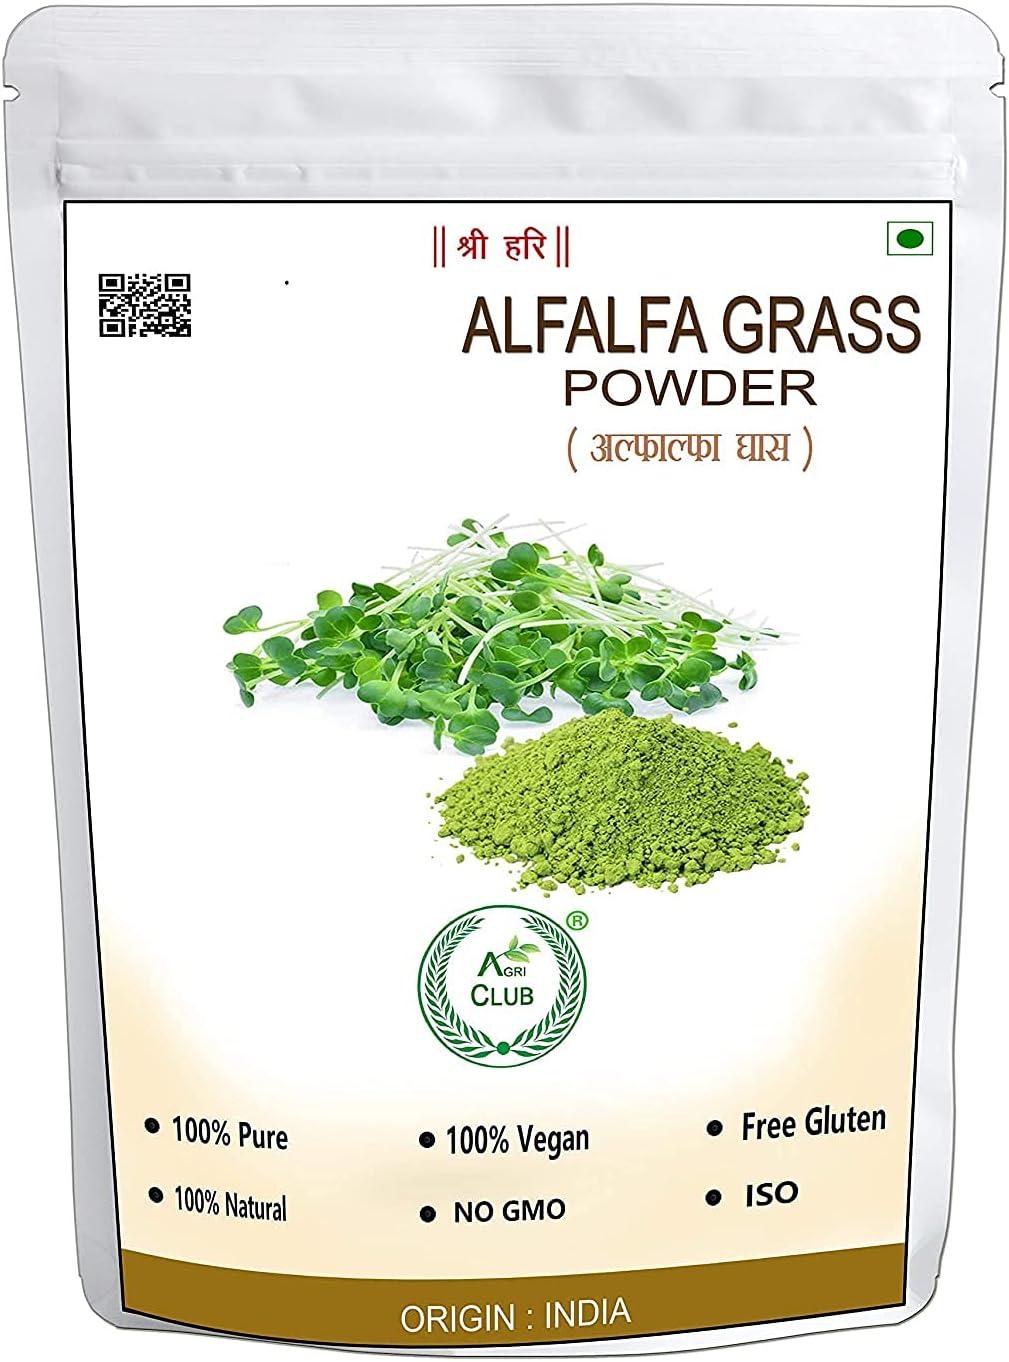 Saheb Agri Club Alfalfa 100 Grass Powder Max Surprise price 79% OFF Gm